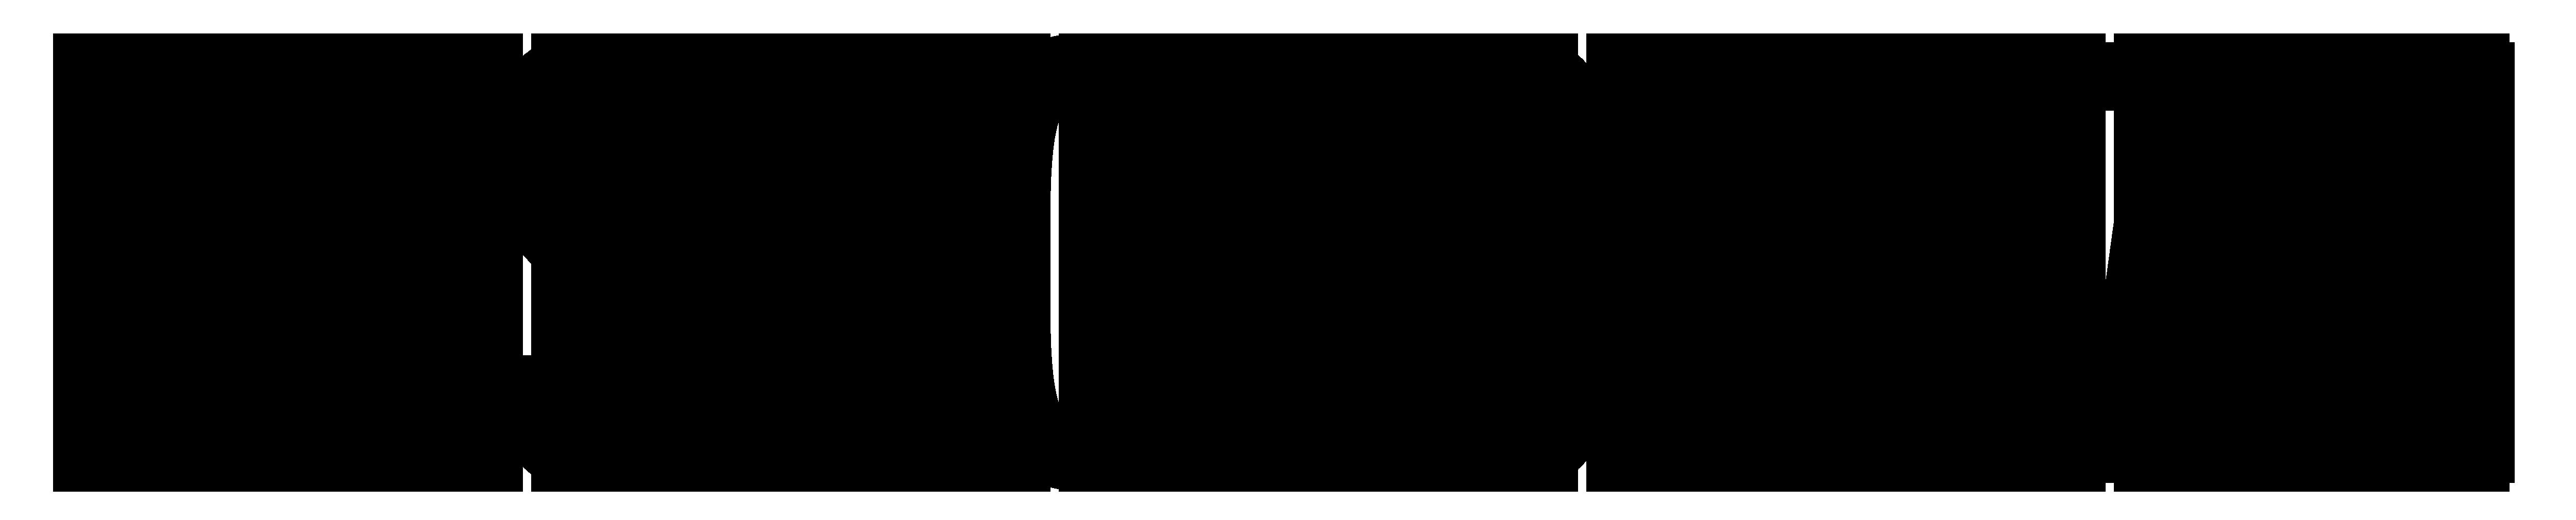 http://sabrinaphilipp.com/wp-content/uploads/2018/02/bw-Cosmopolitan_logo_wordmark_logotype.png